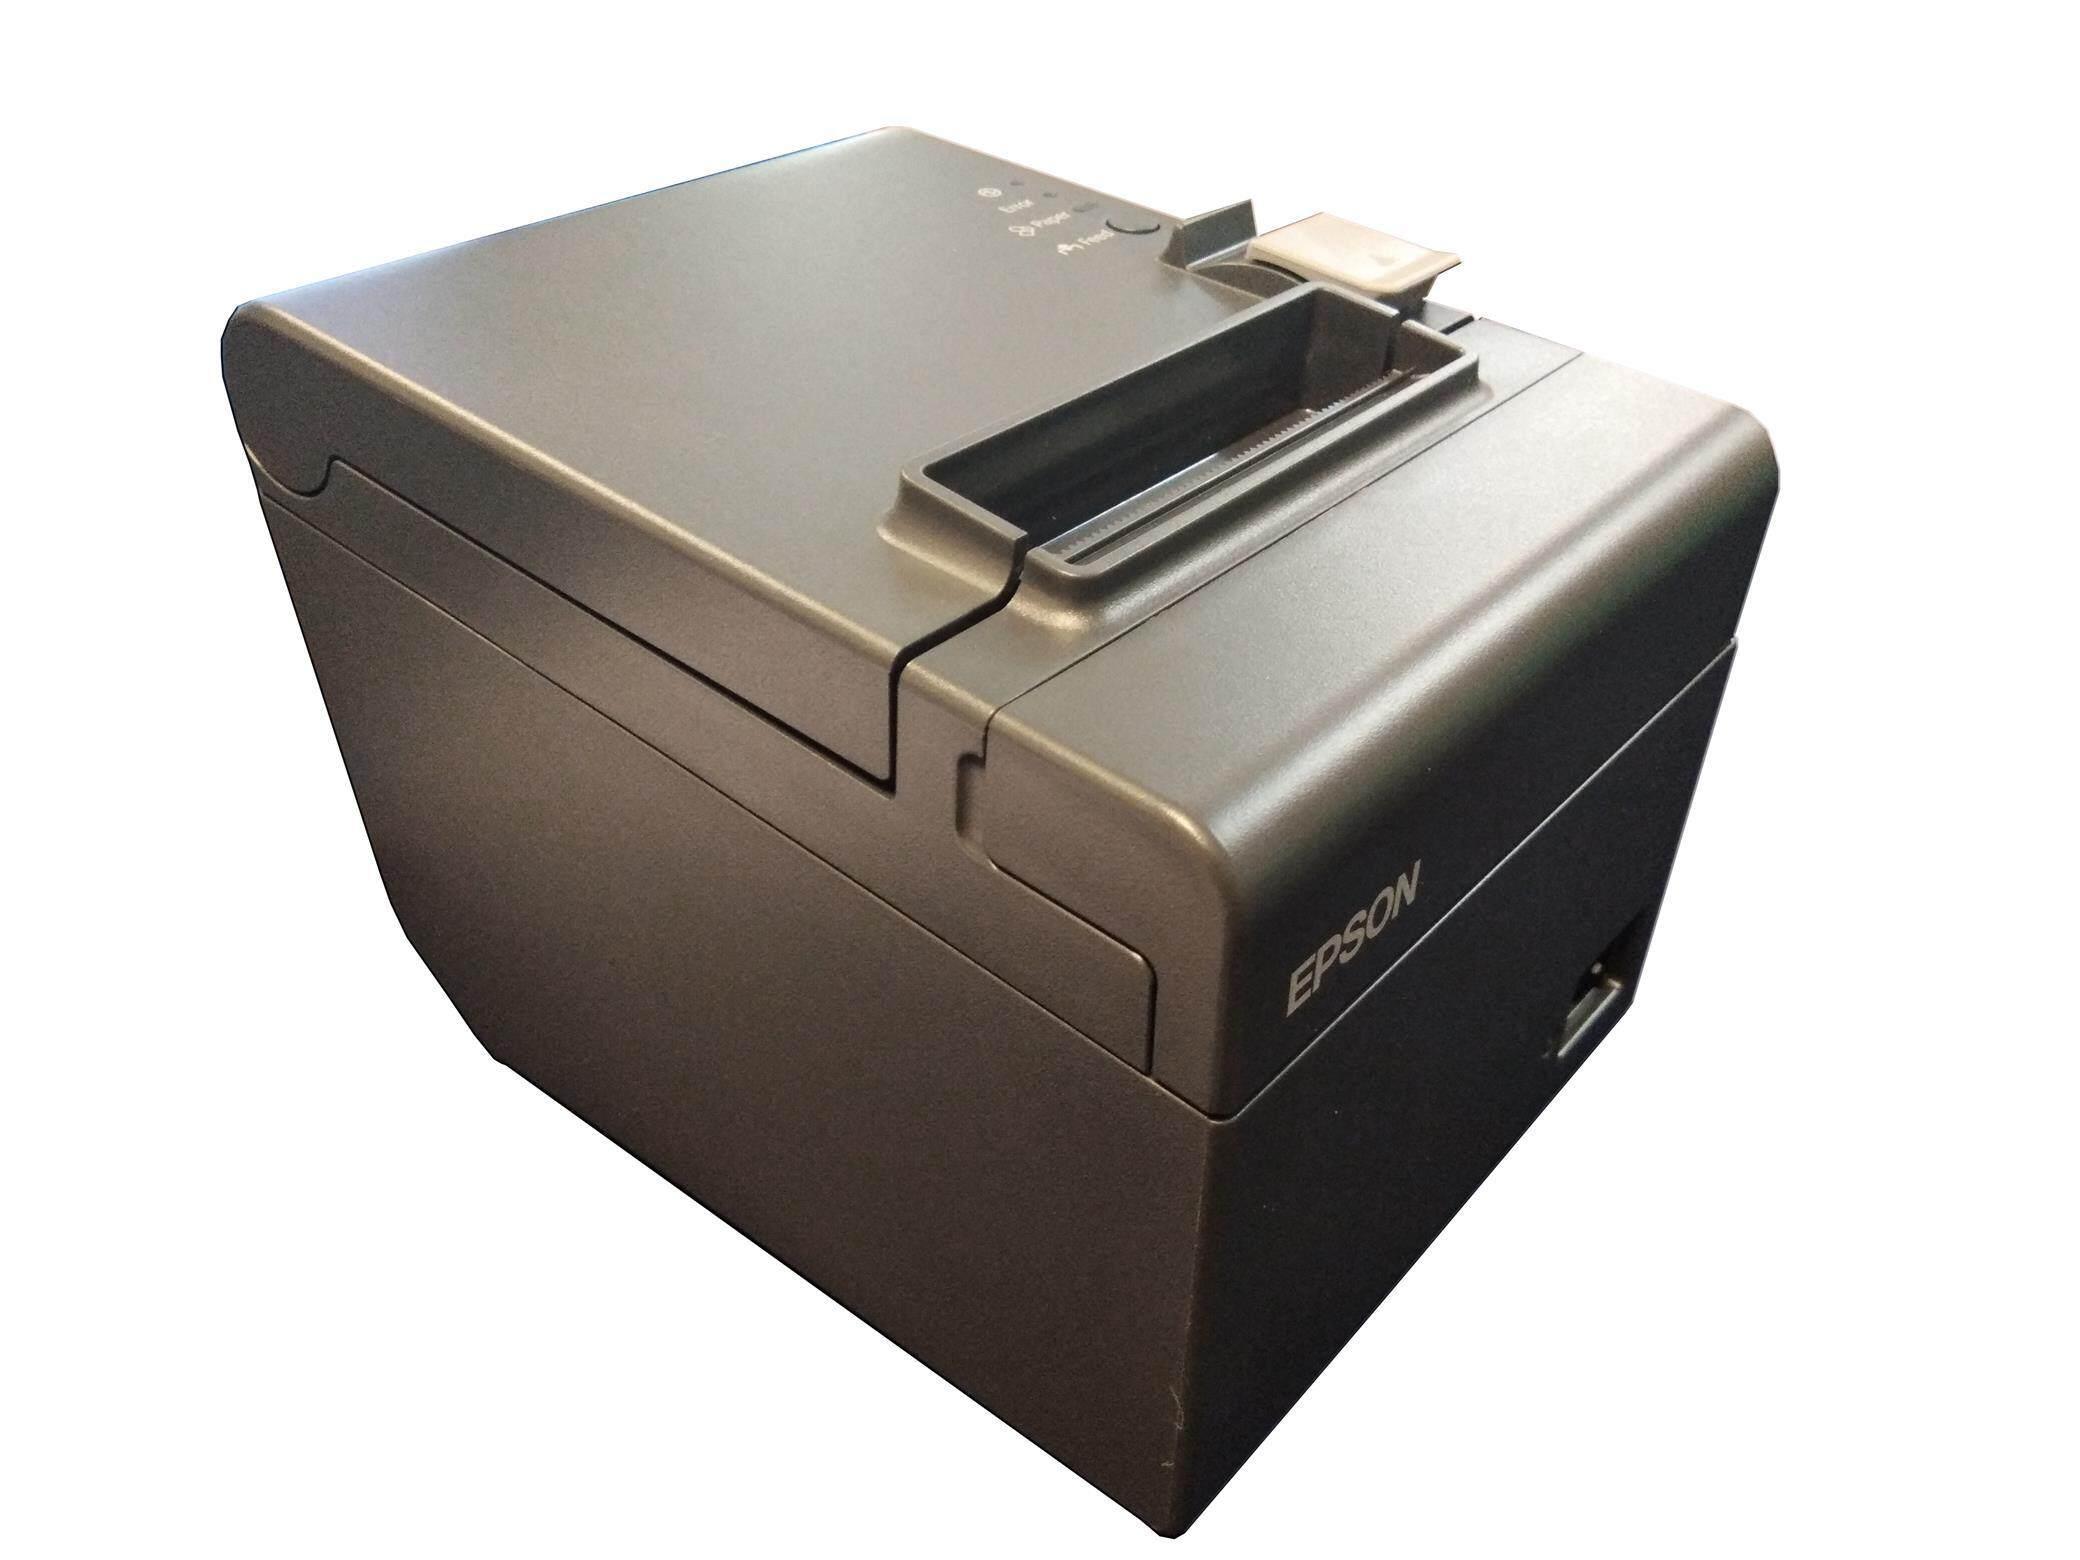 Epson Thermal Receipt Printer TM-T82 with Lan port kitchen printer (second hand)